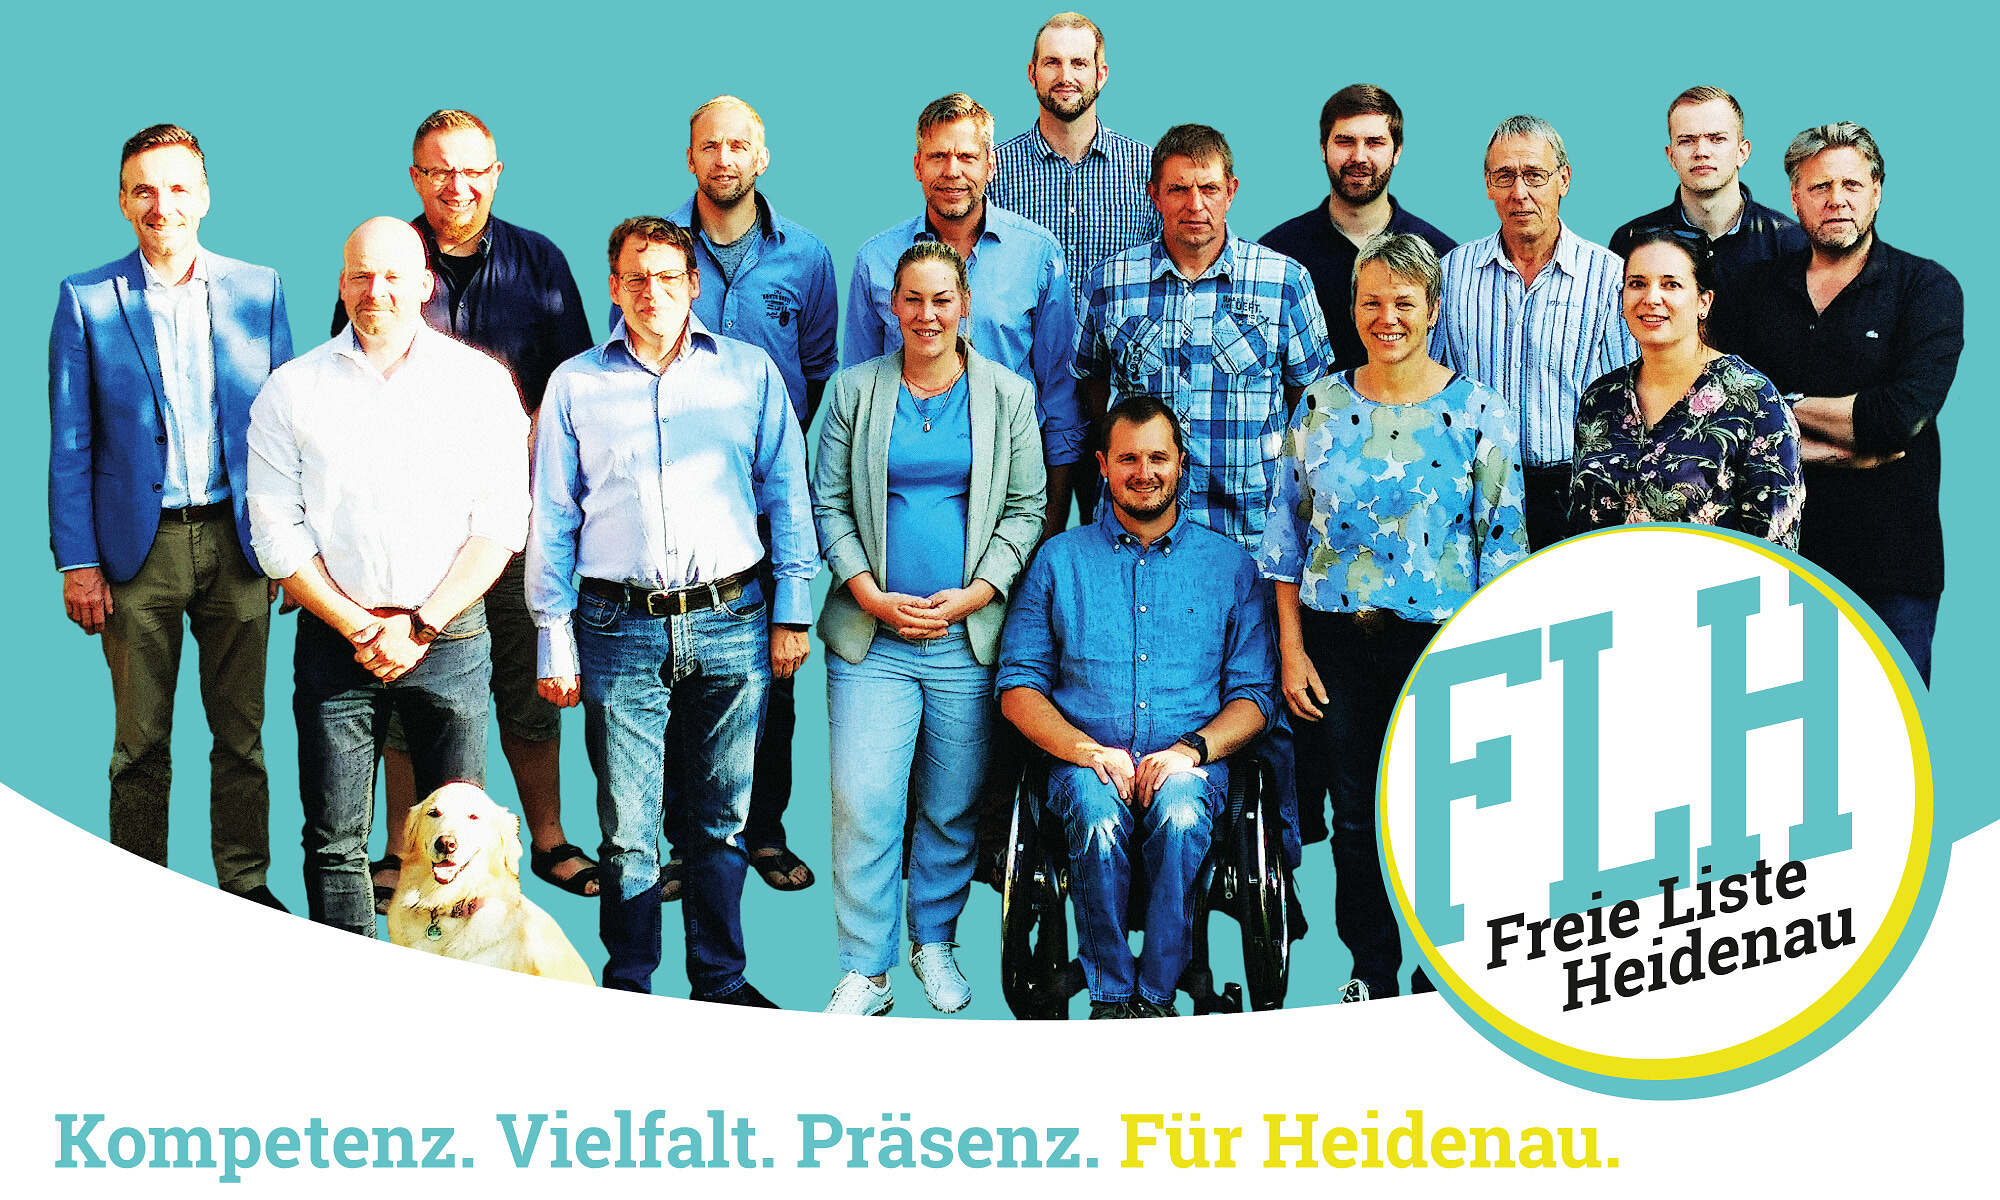 FLH Freie Liste Heidenau